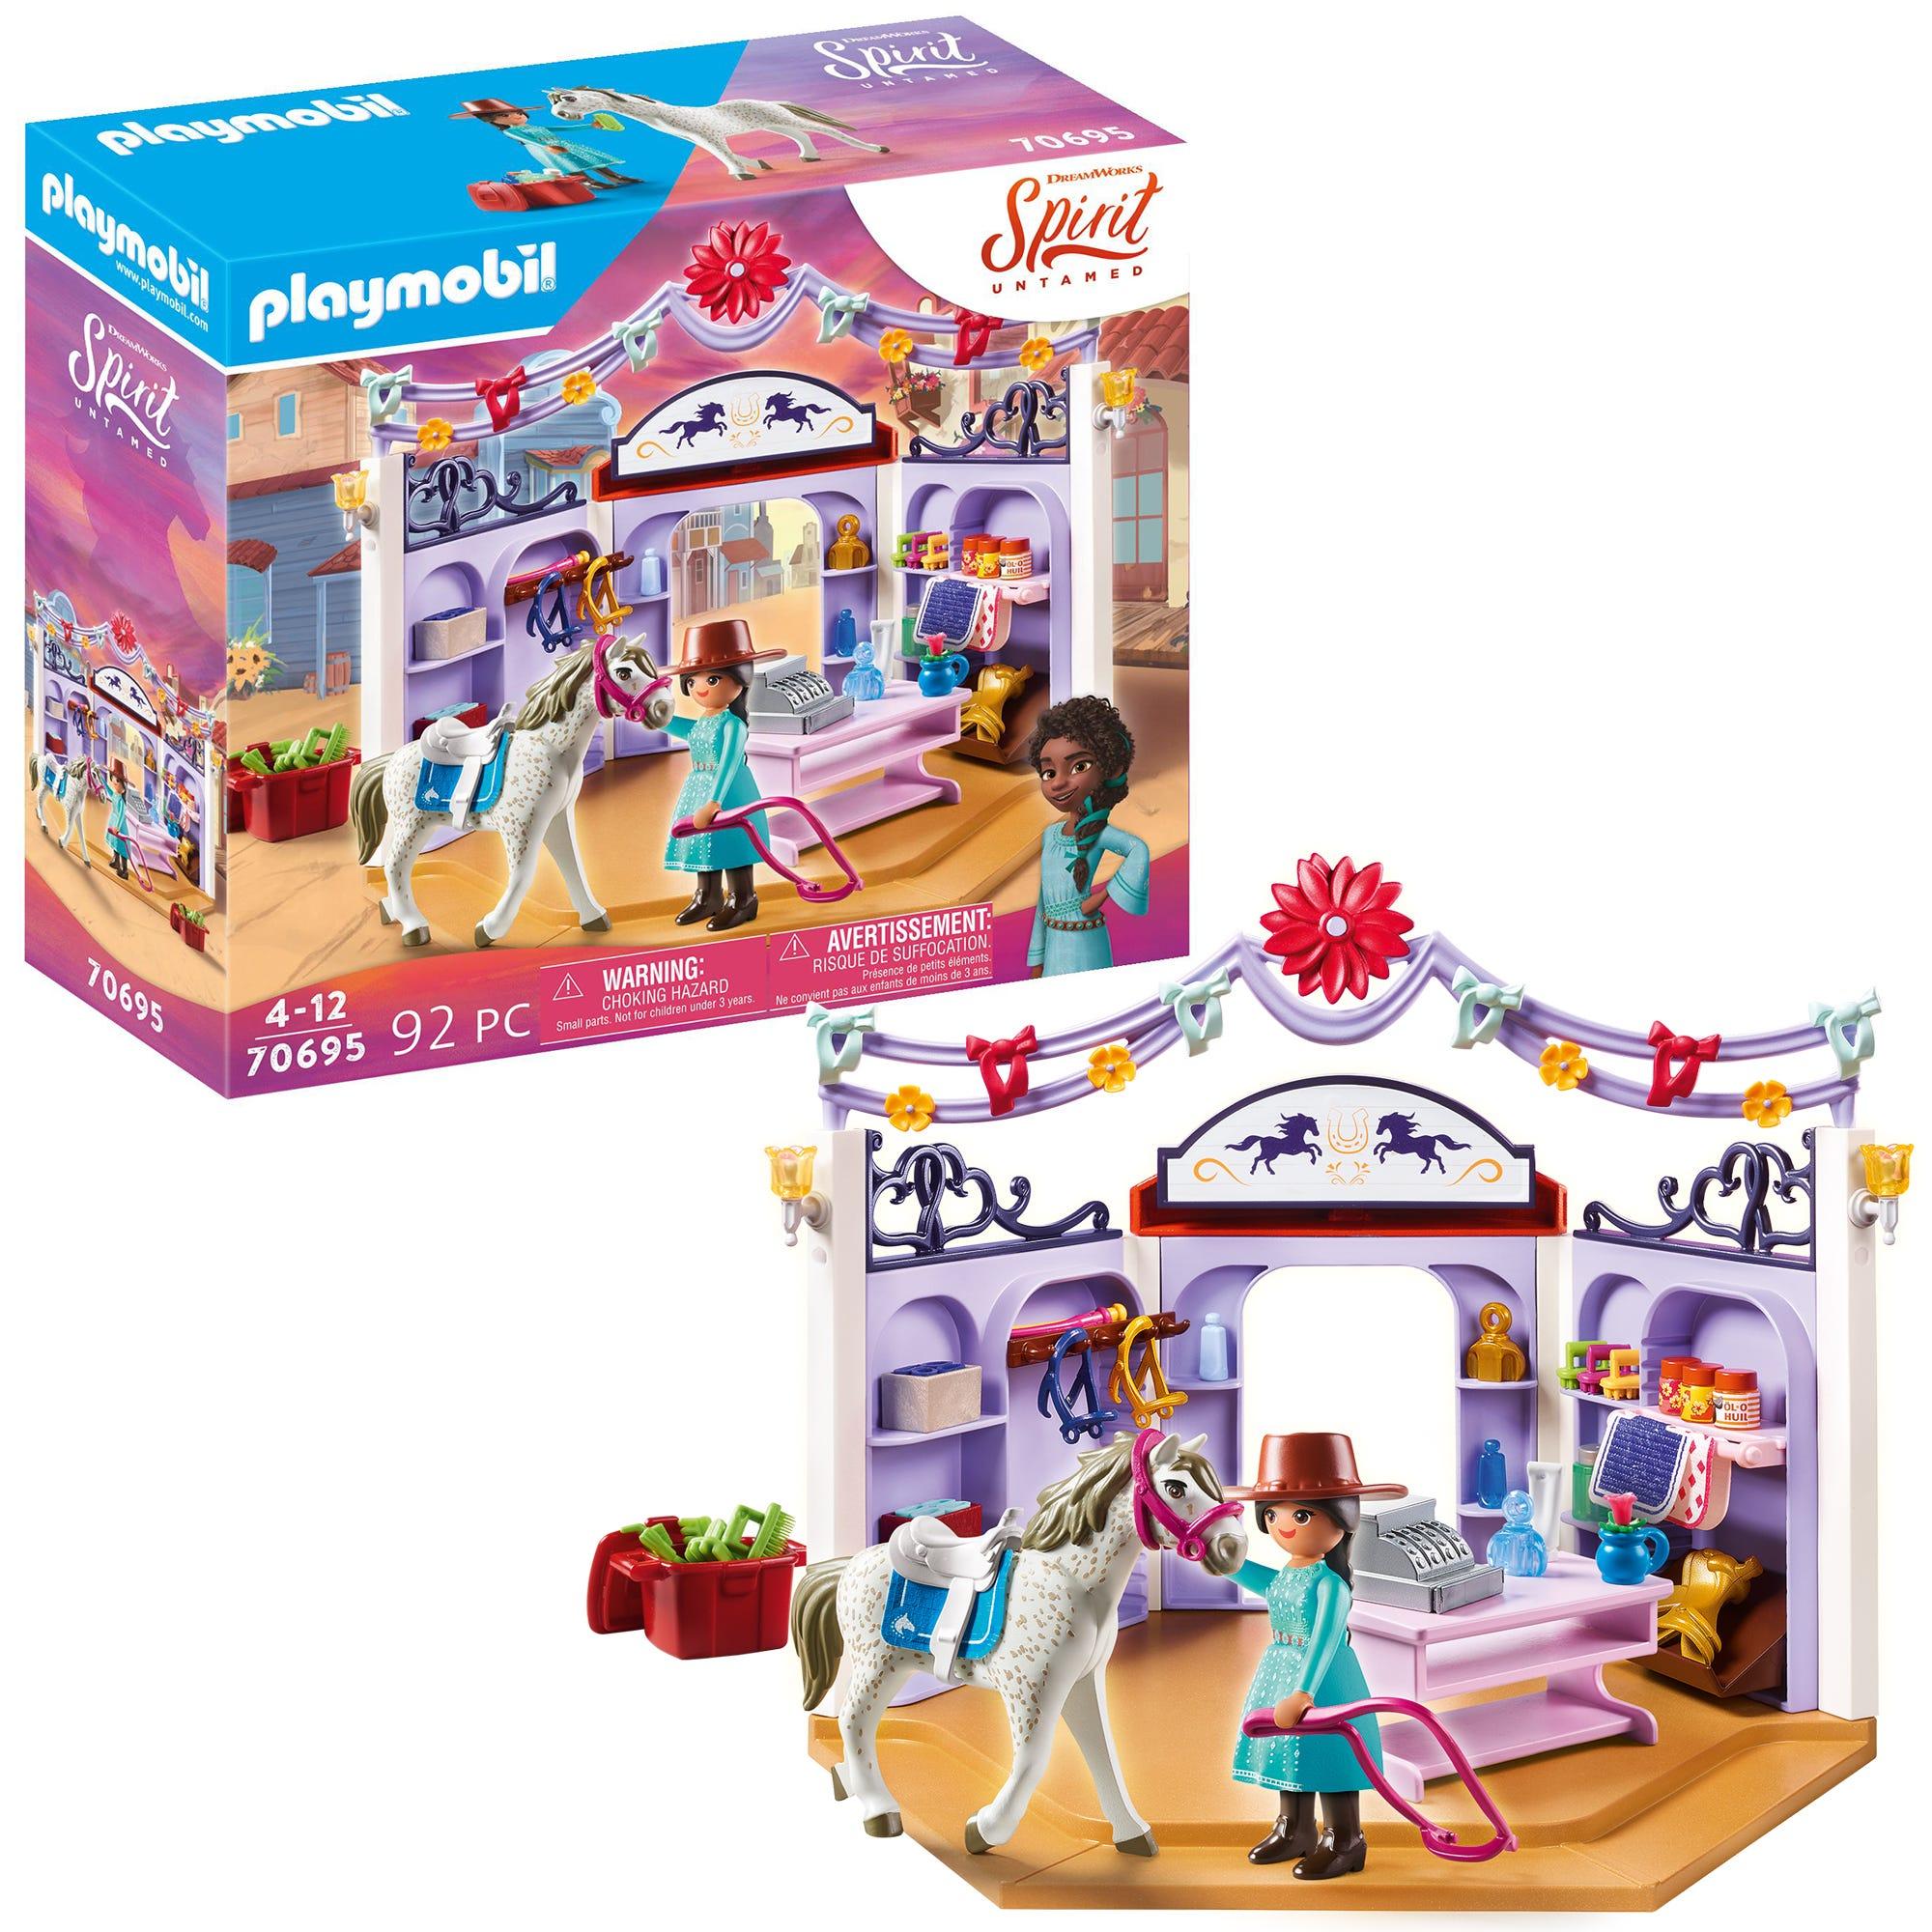 Dreamworks Spirit: Untamed 70695 Miradero Tack Shop By Playmobil